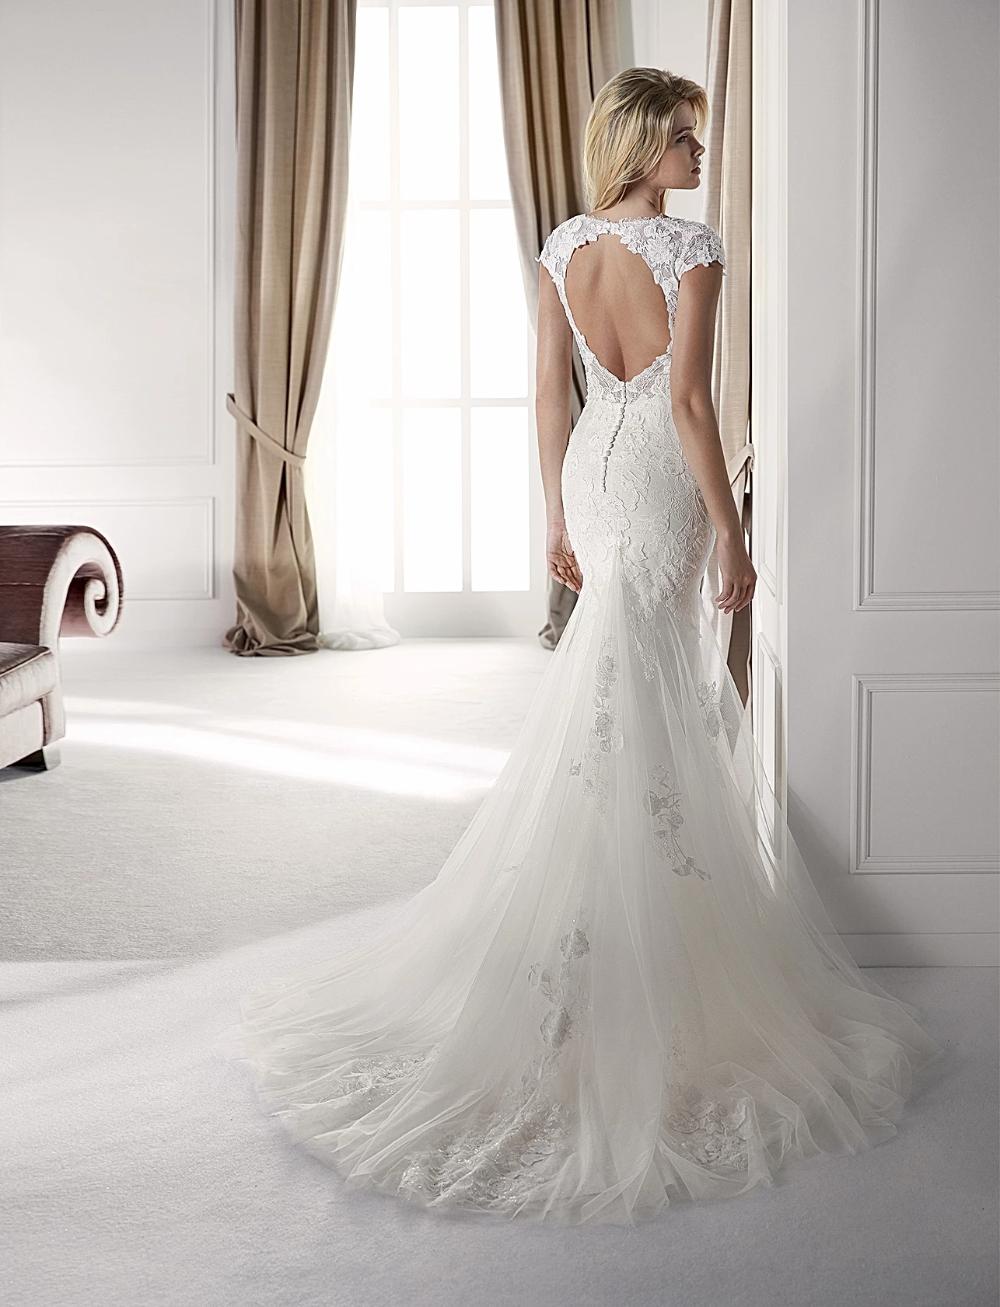 Keyhole Back Wedding Dresses In 2020 Wedding Dresses Dallas Wedding Dresses Chicago Nicole Spose Wedding Dress